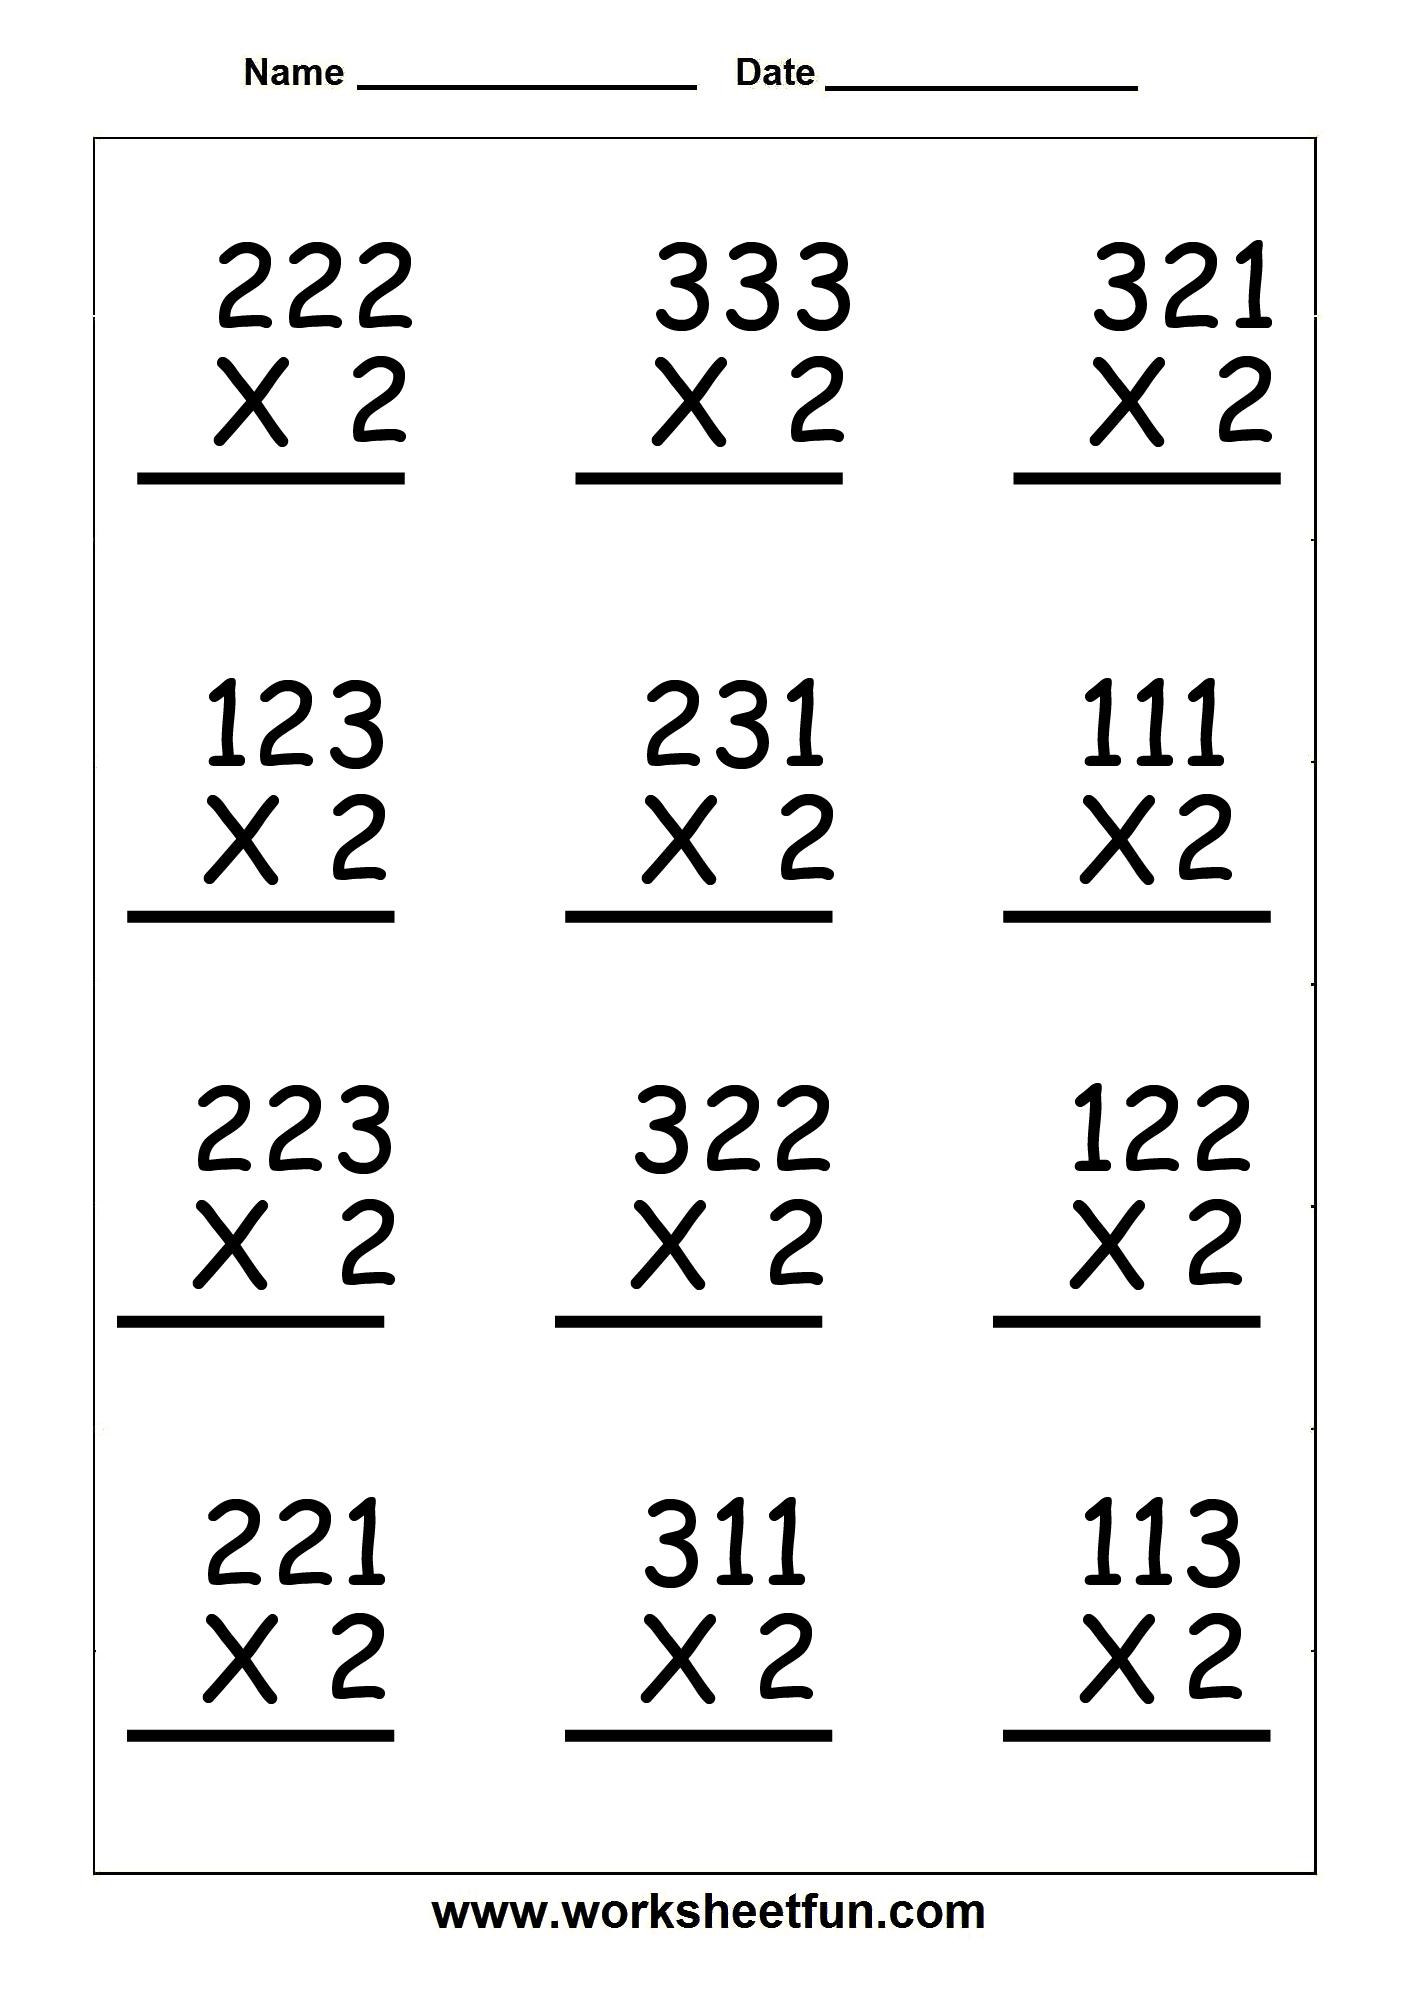 Copy Of Single Digit Multiplication Worksheets - Lessons - Tes Teach | 3 Digit Multiplication Worksheets Printable